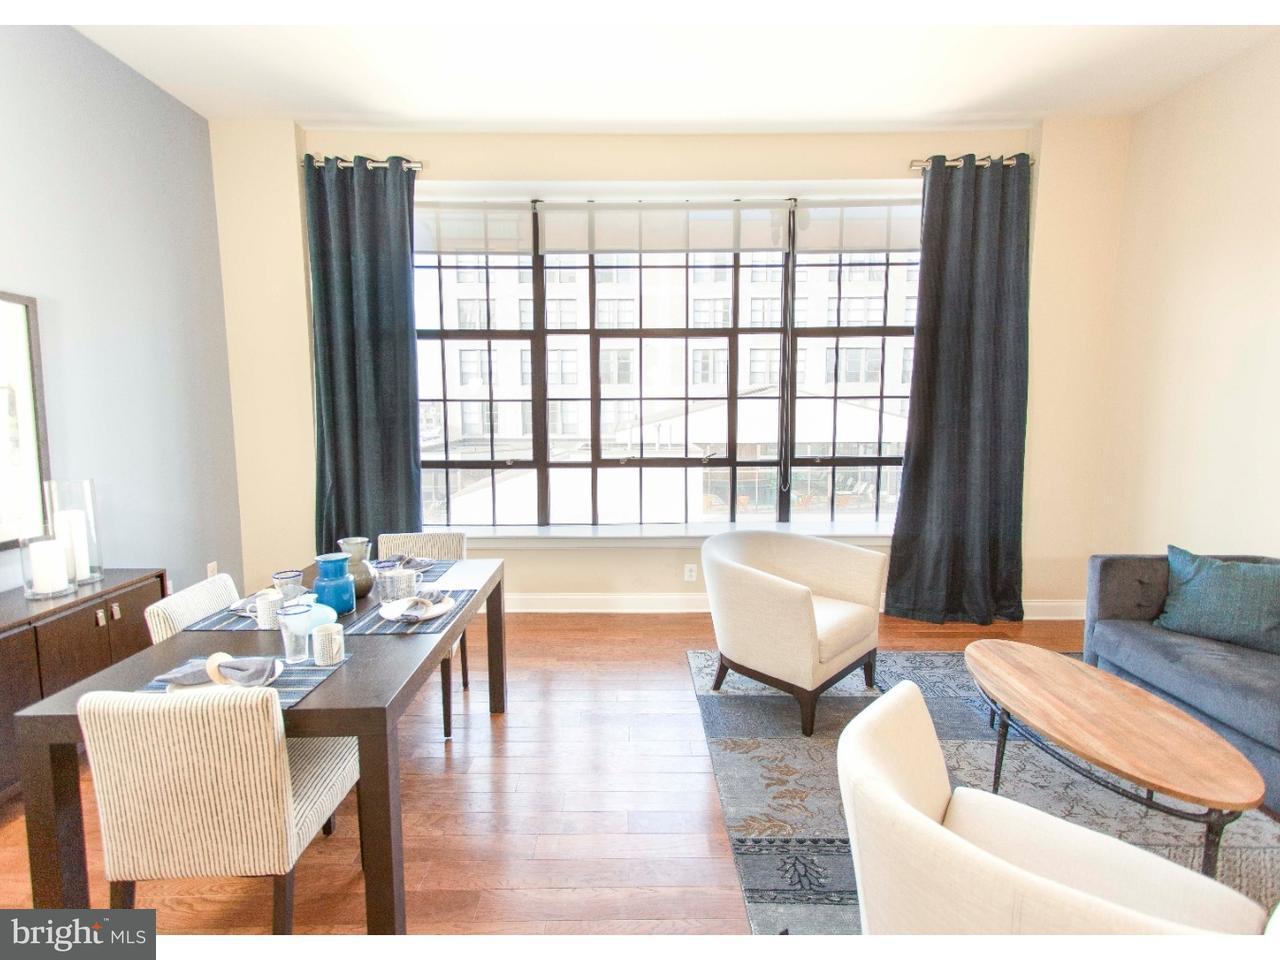 Single Family Home for Rent at 600 N BROAD ST #206 Philadelphia, Pennsylvania 19130 United States